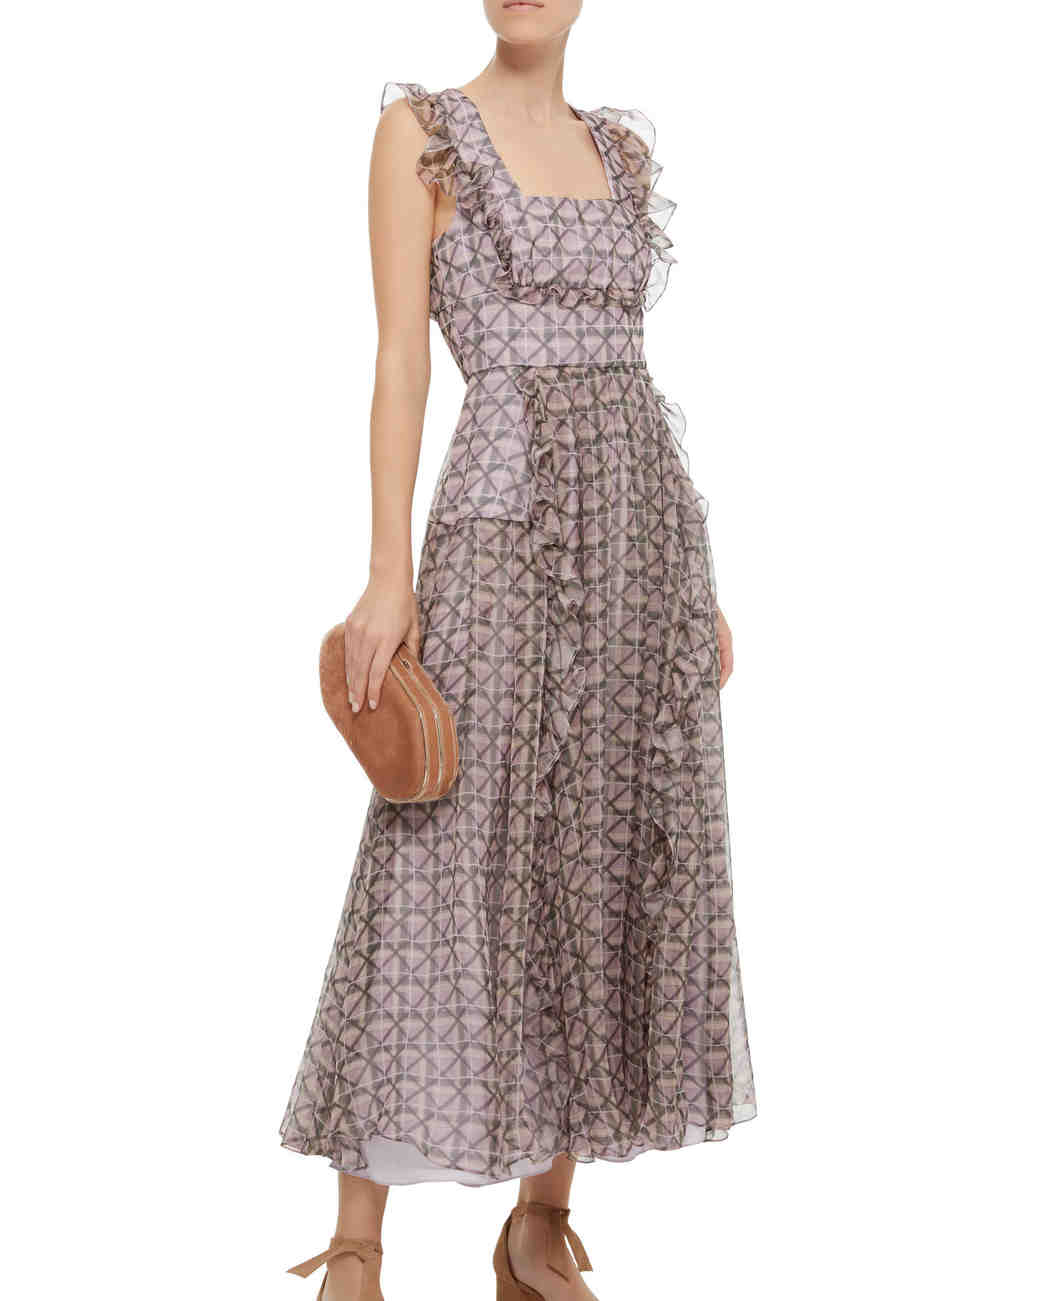 Alexa Chung Engagement Party Dress, Patterned Midi